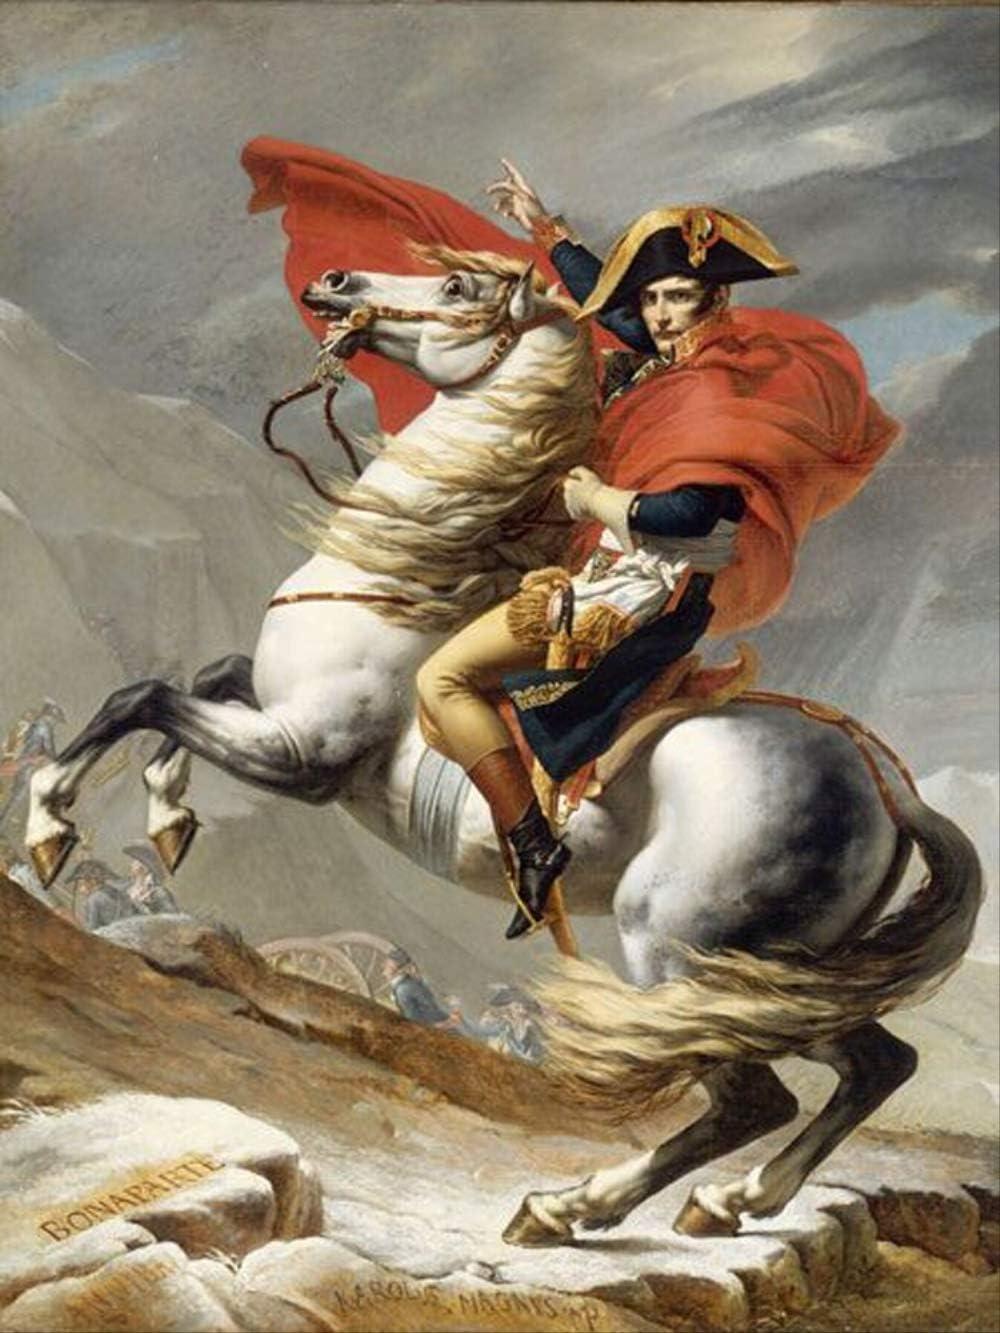 FSGEIV pintura al oleo Pintura al óleo clásica pintada a mano pura Pintura al óleo del caballo de montar a caballo francés Napoleón para la decoración de la pared 24x36